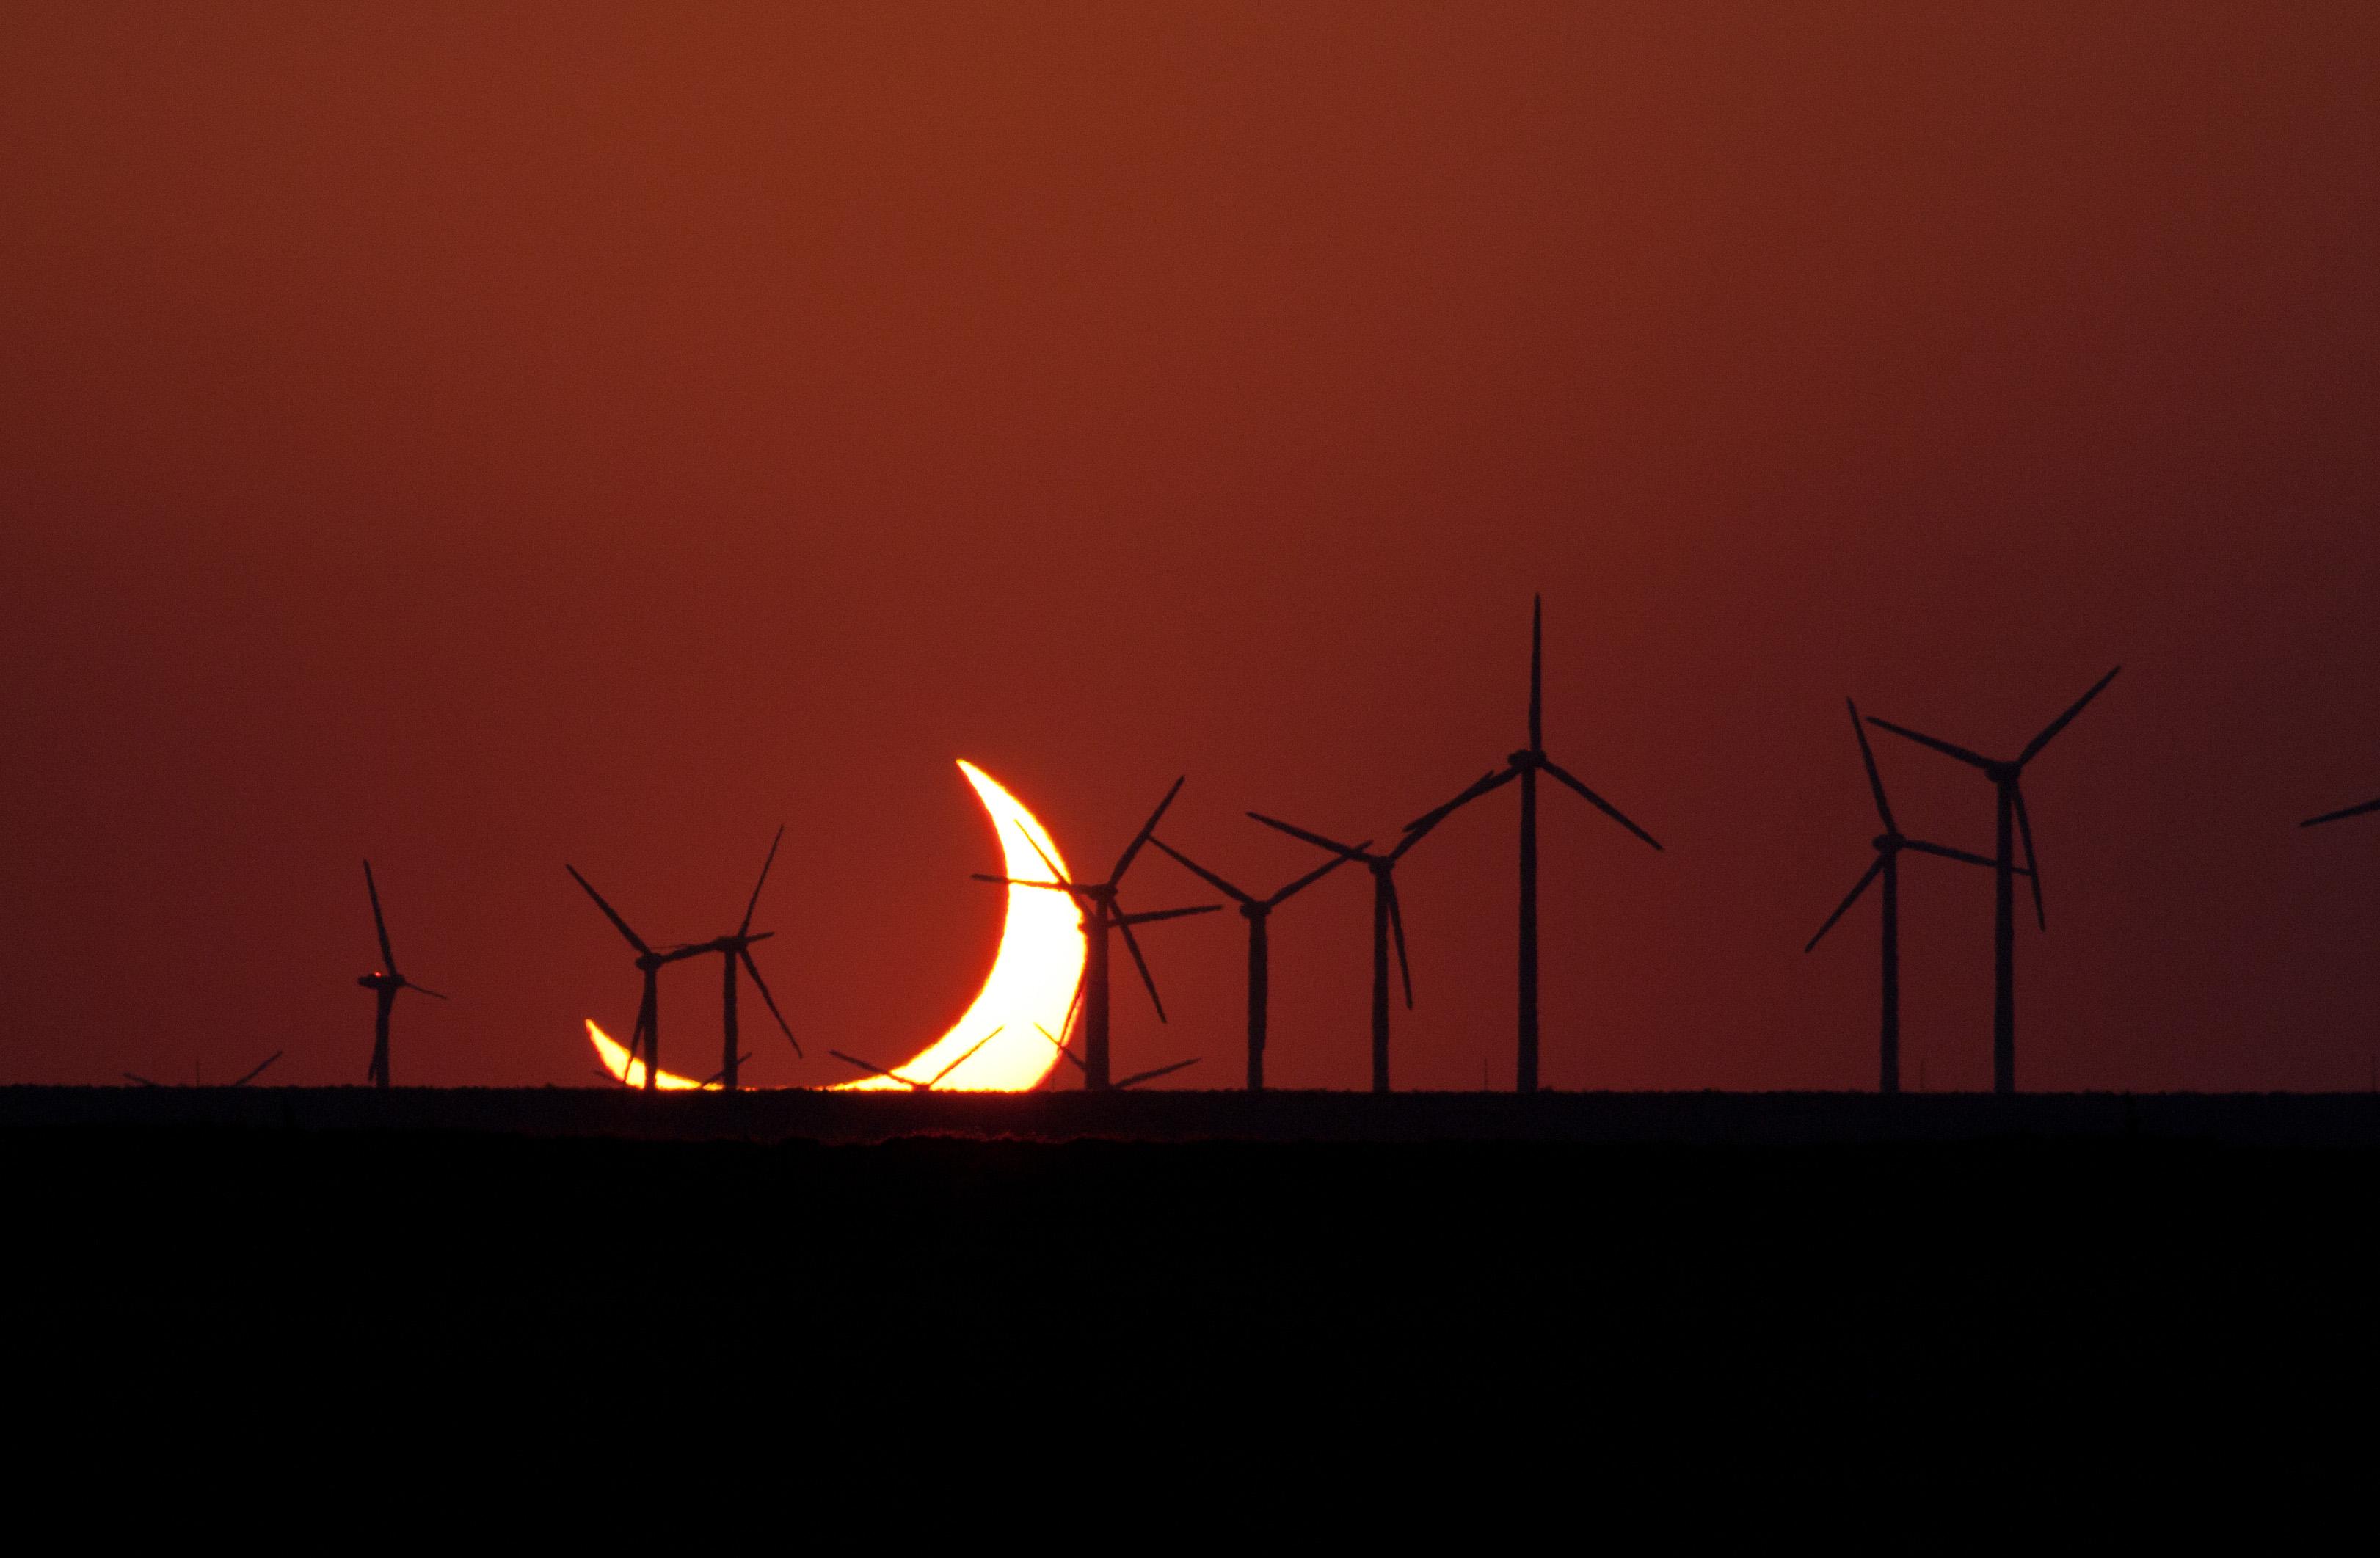 Solar eclipse on the horizon